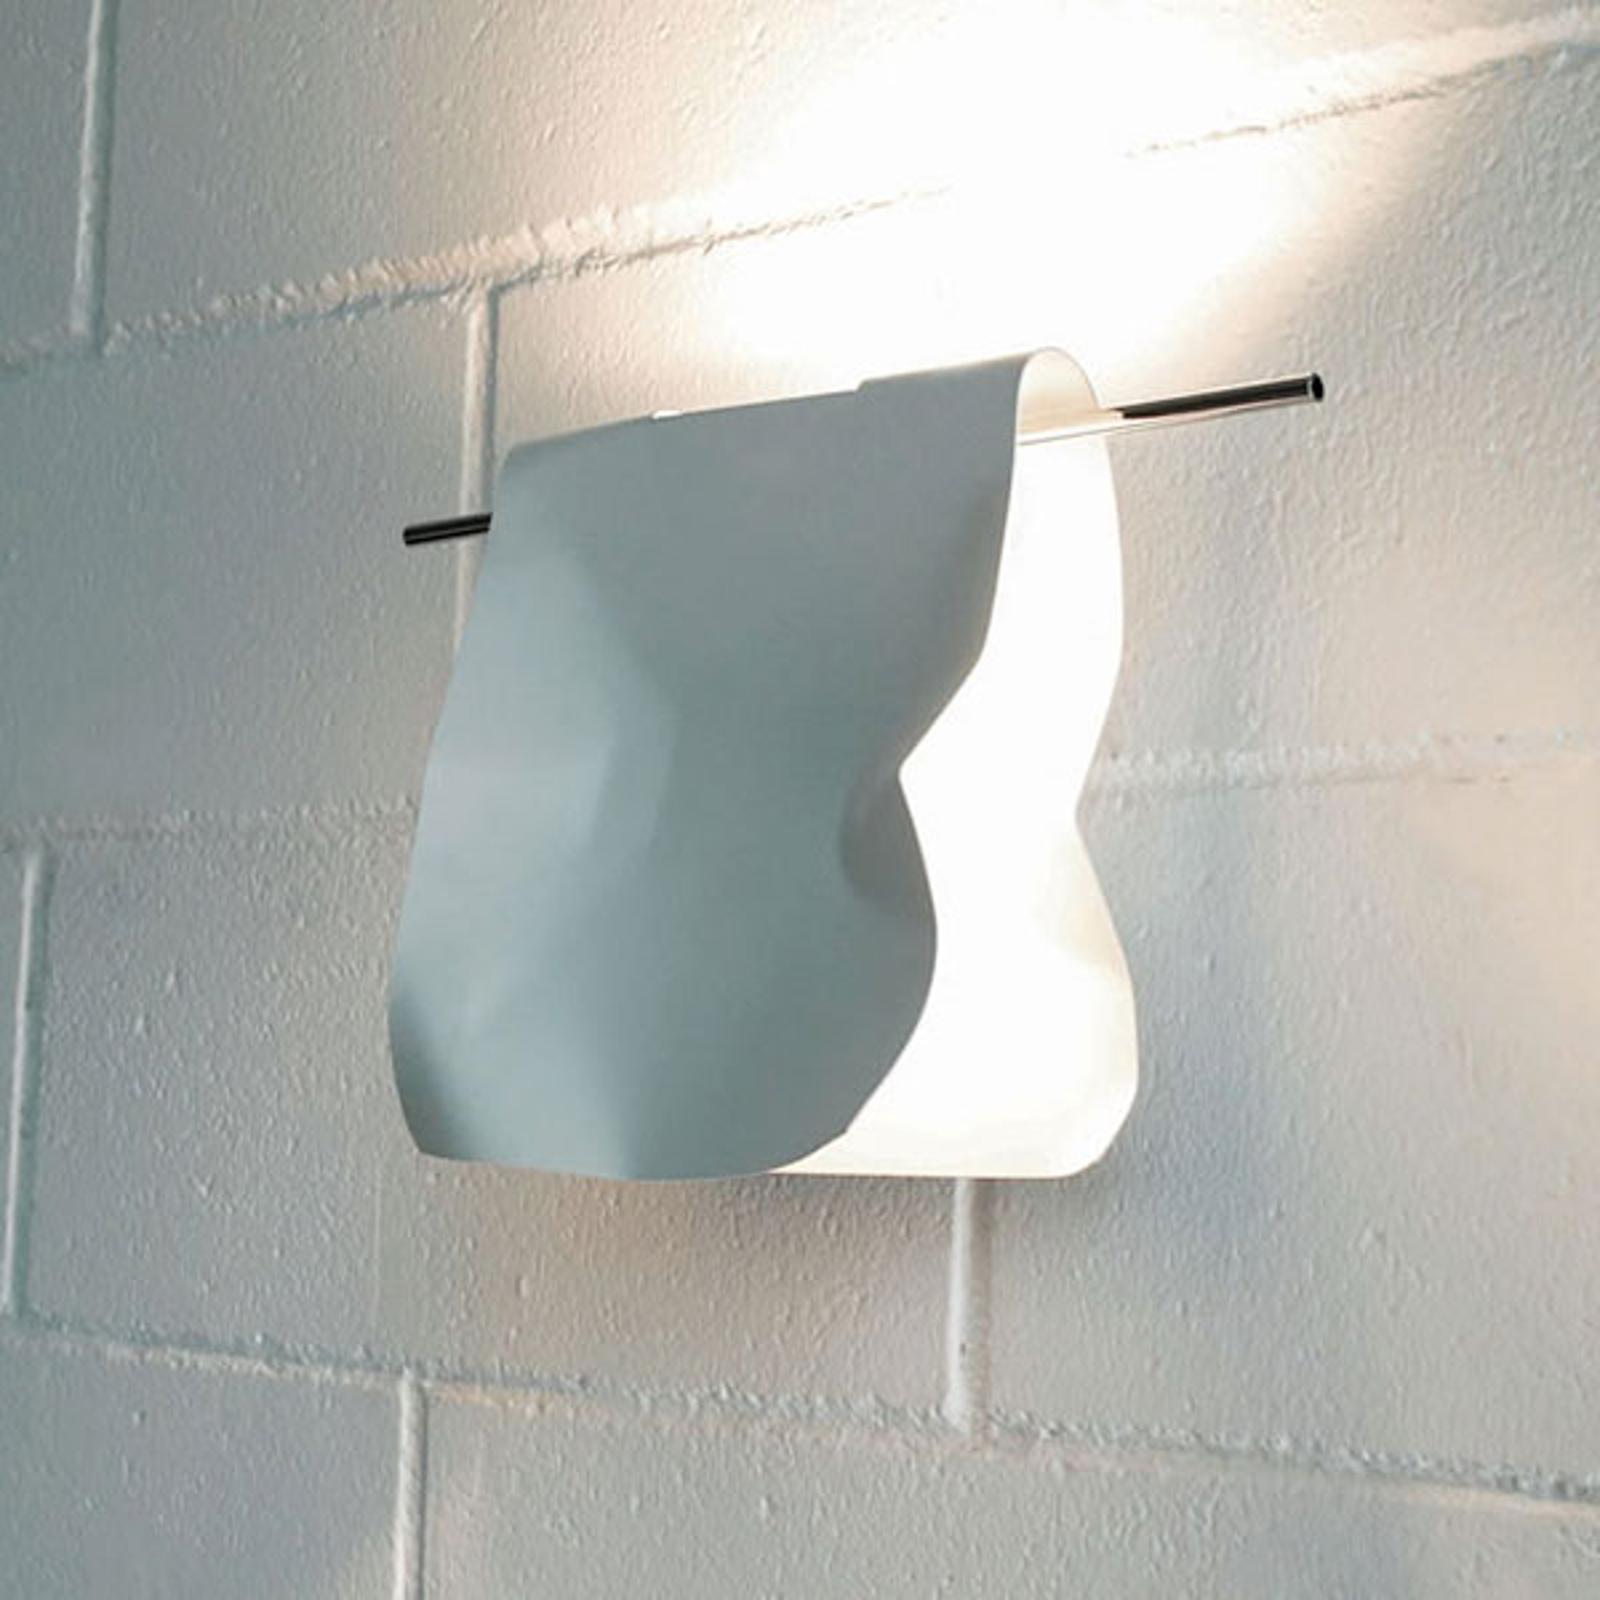 Knikerboker Stendimi - LED-Wandleuchte, weiß